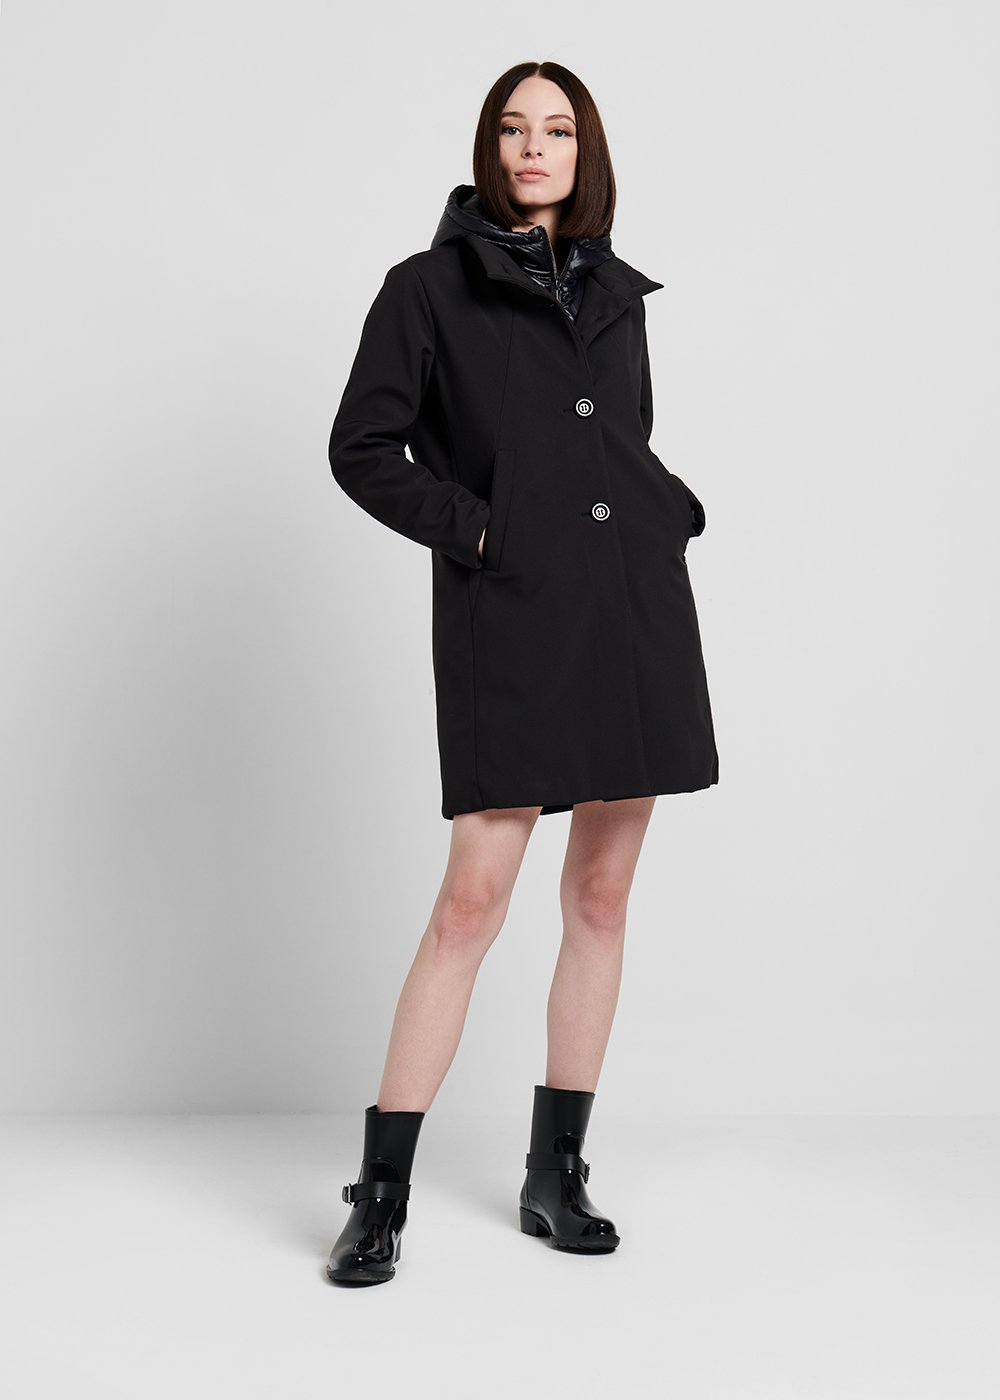 Conan coat in technical fabric with nylon bib - Black - Woman